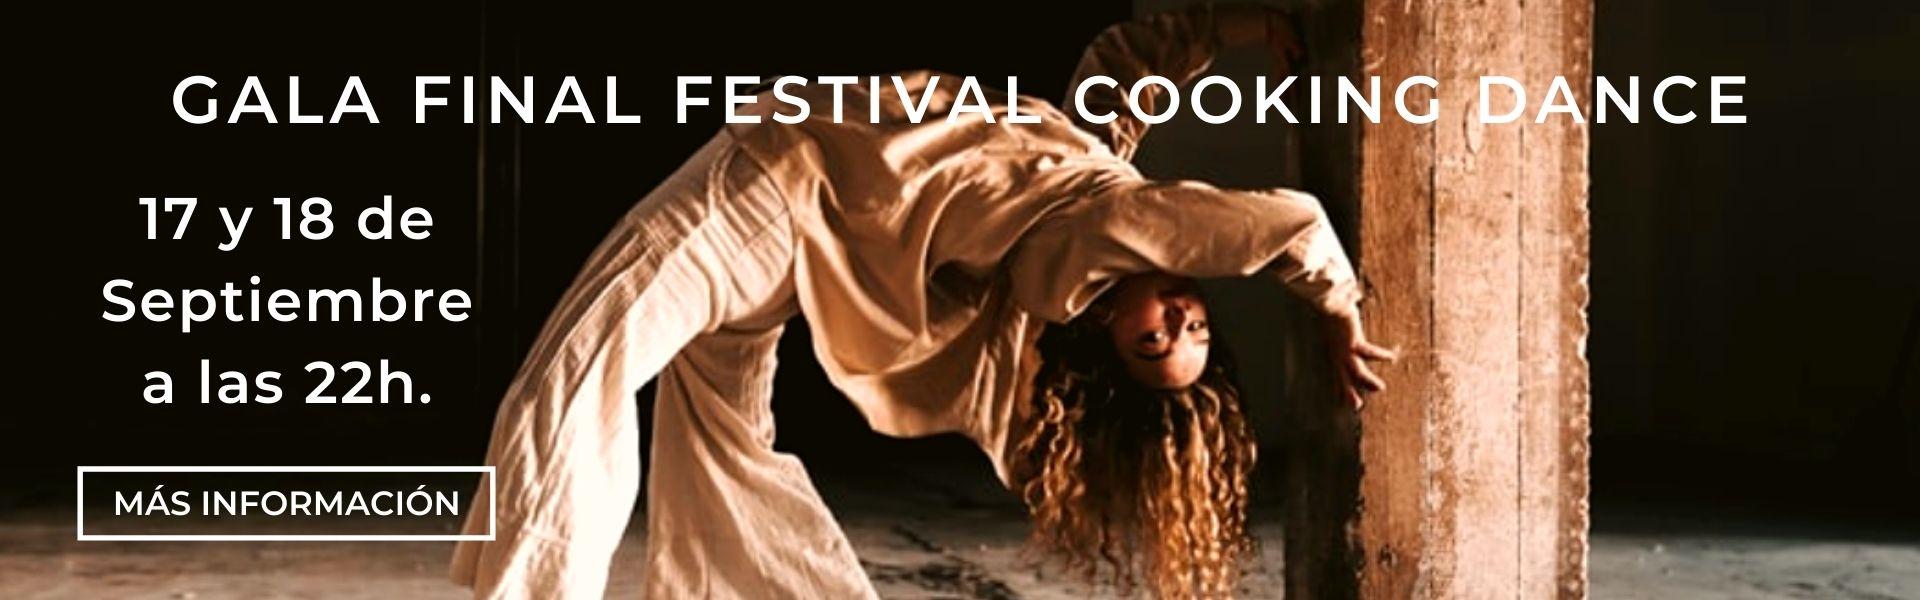 GALA FINAL del FESTIVAL COOKING DANCE